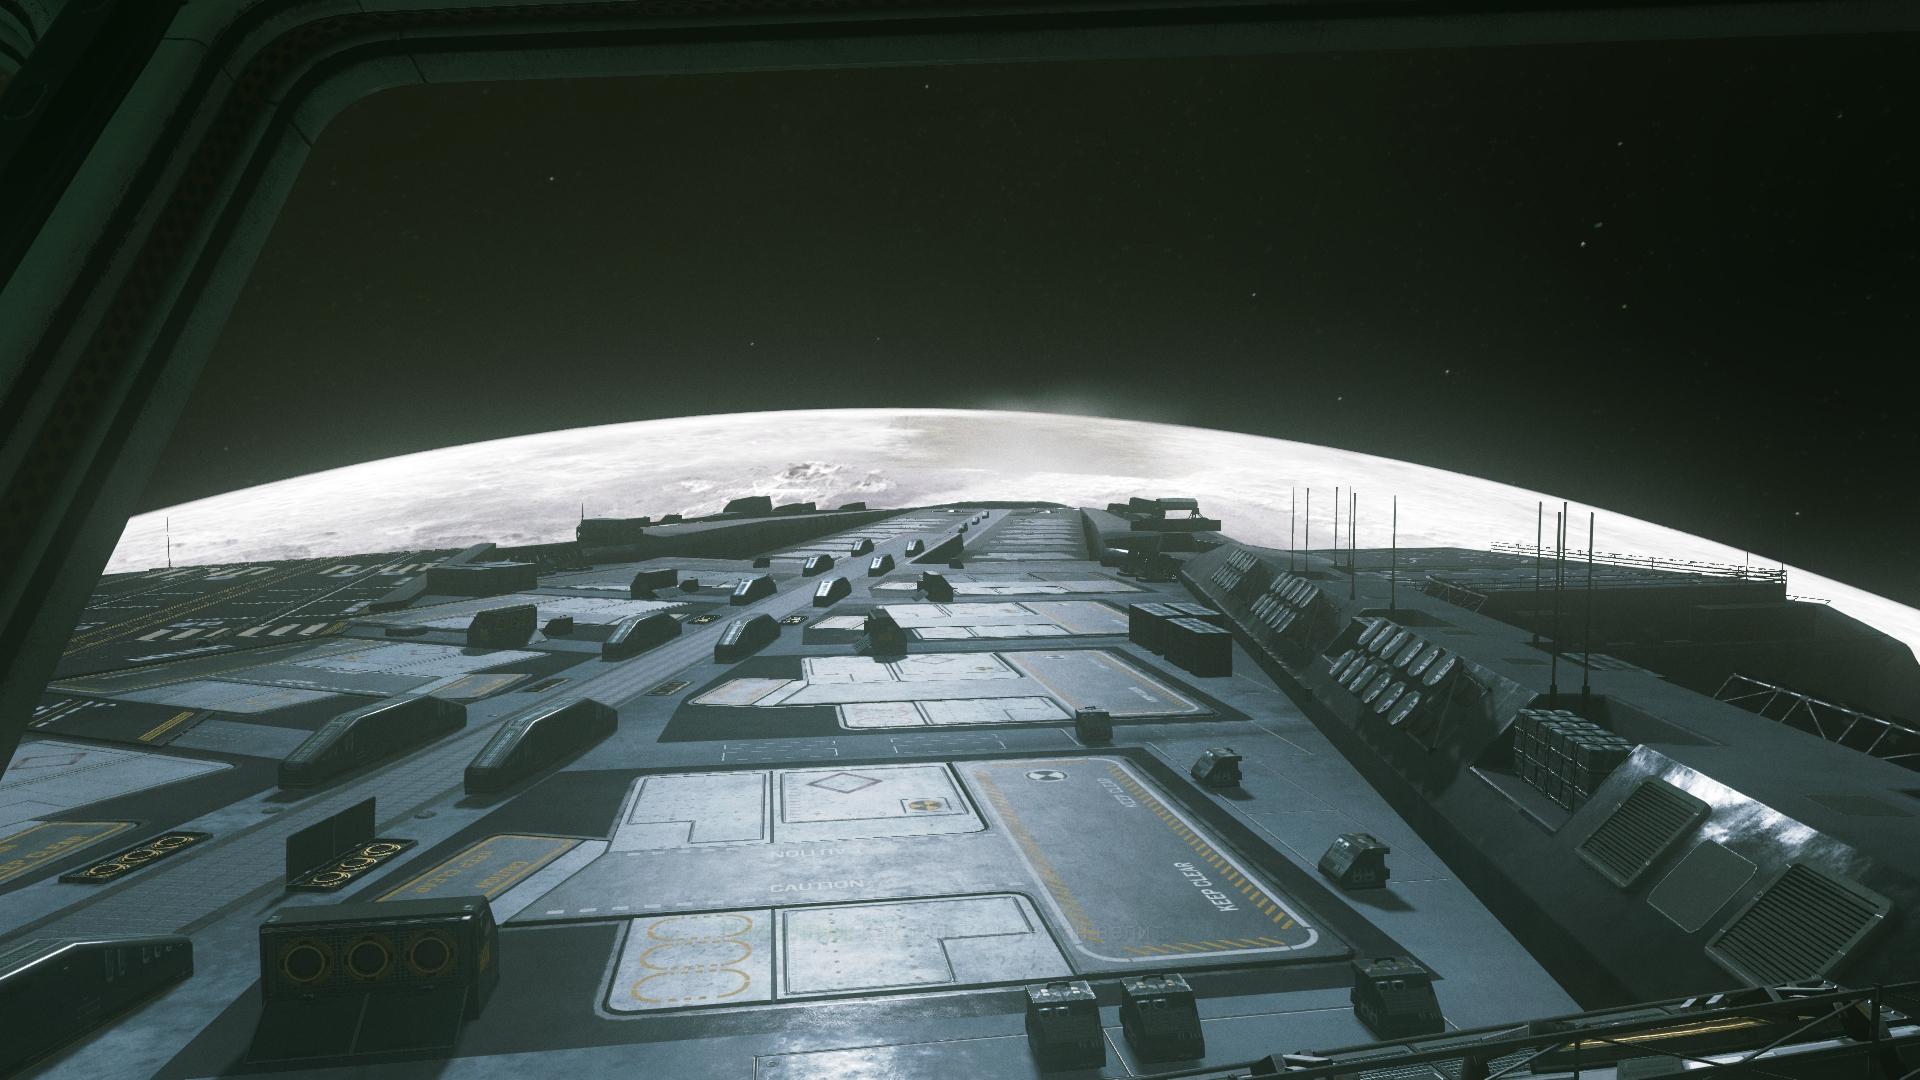 00052.Jpg - Call of Duty: Infinite Warfare